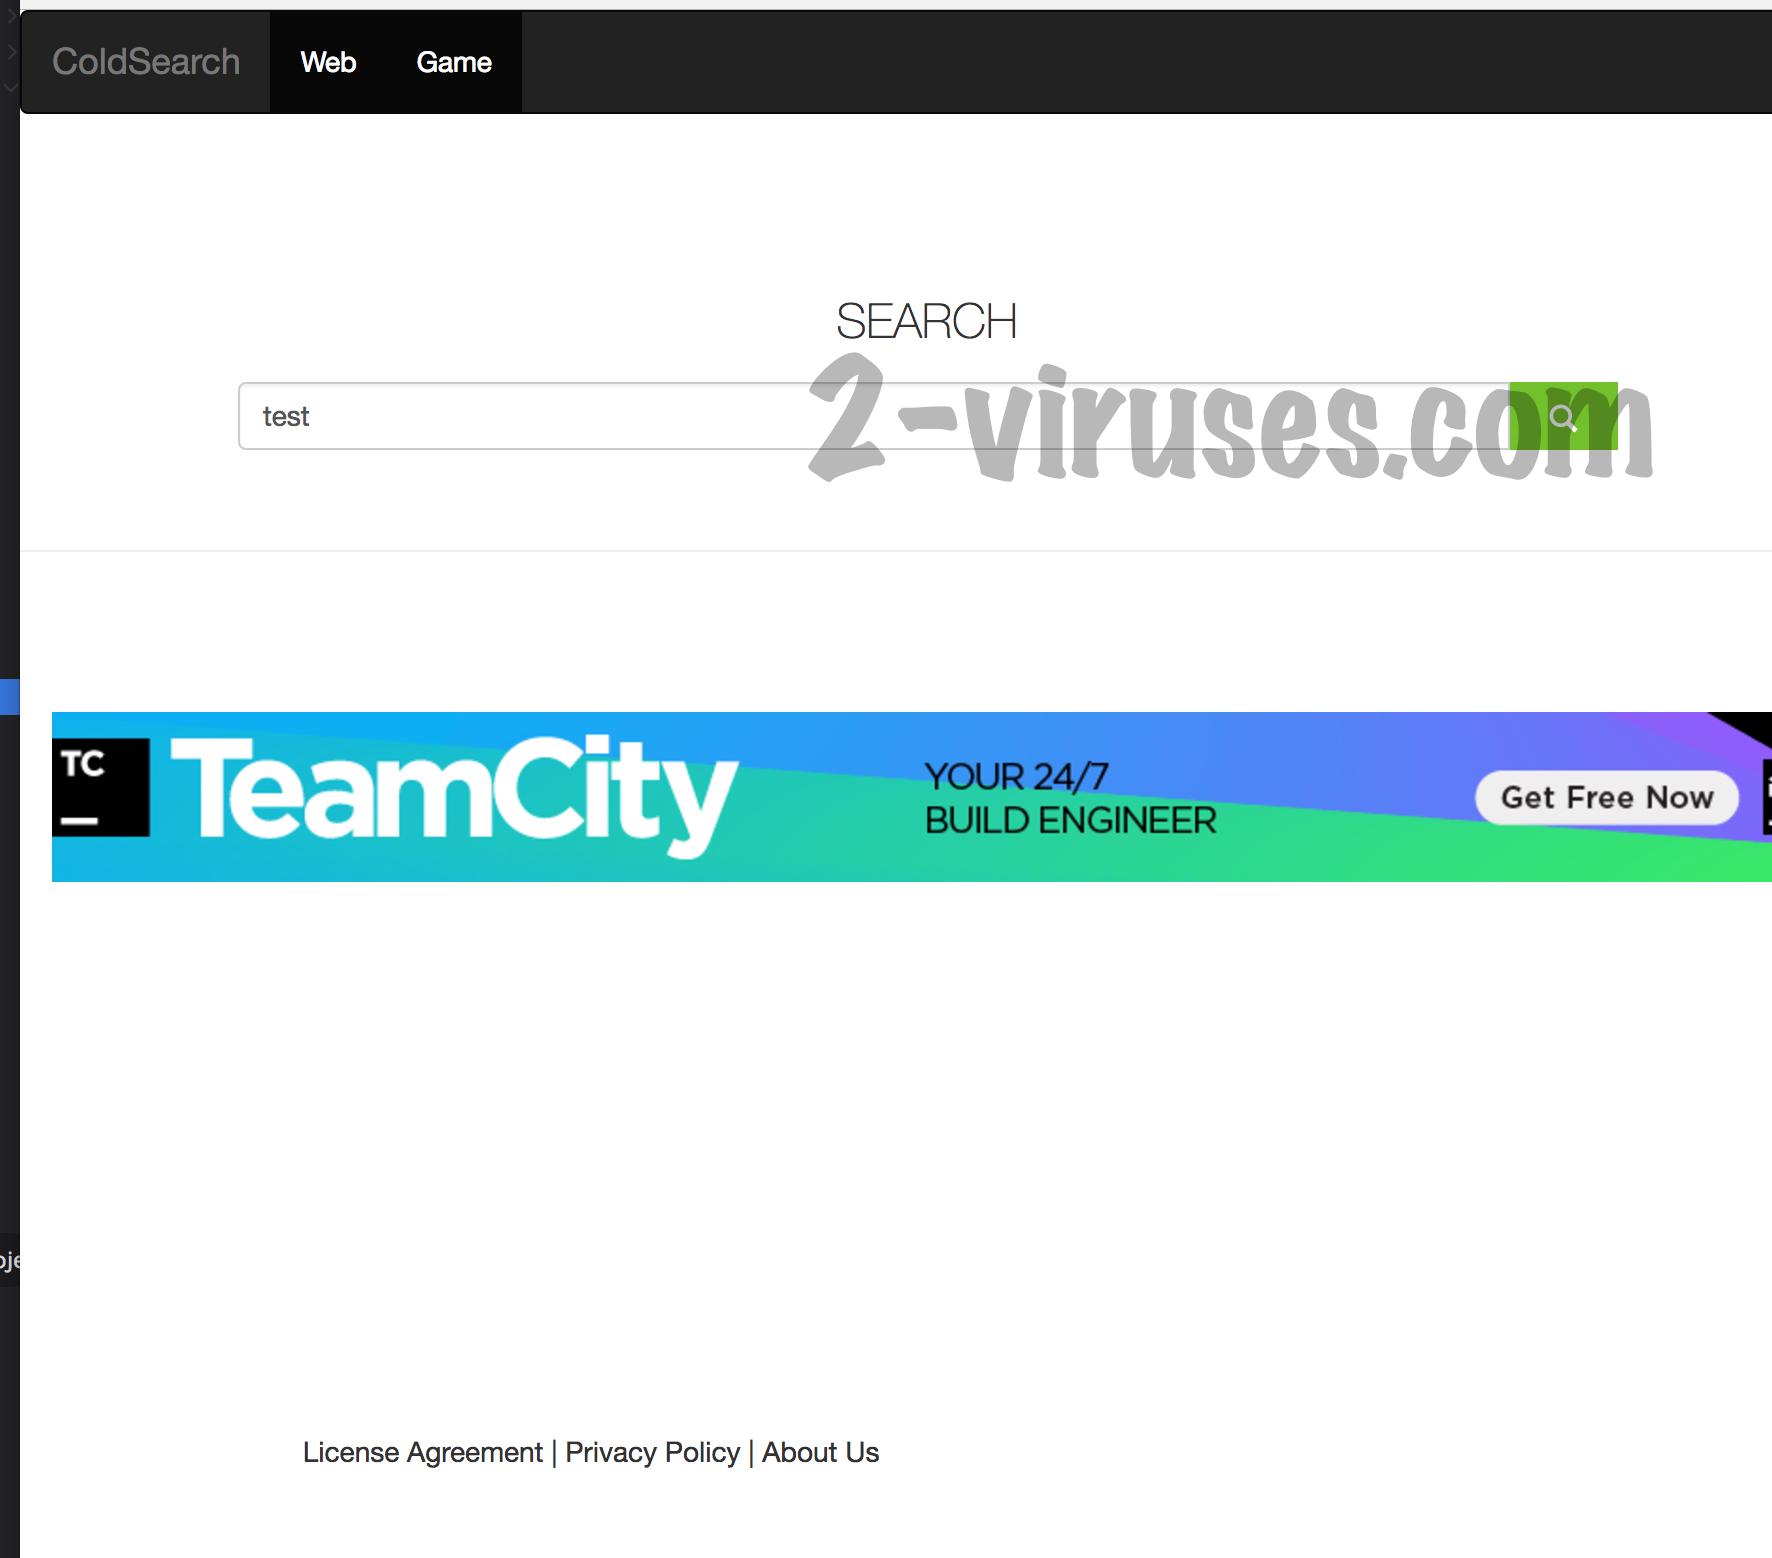 coldsearch-com-2-viruses